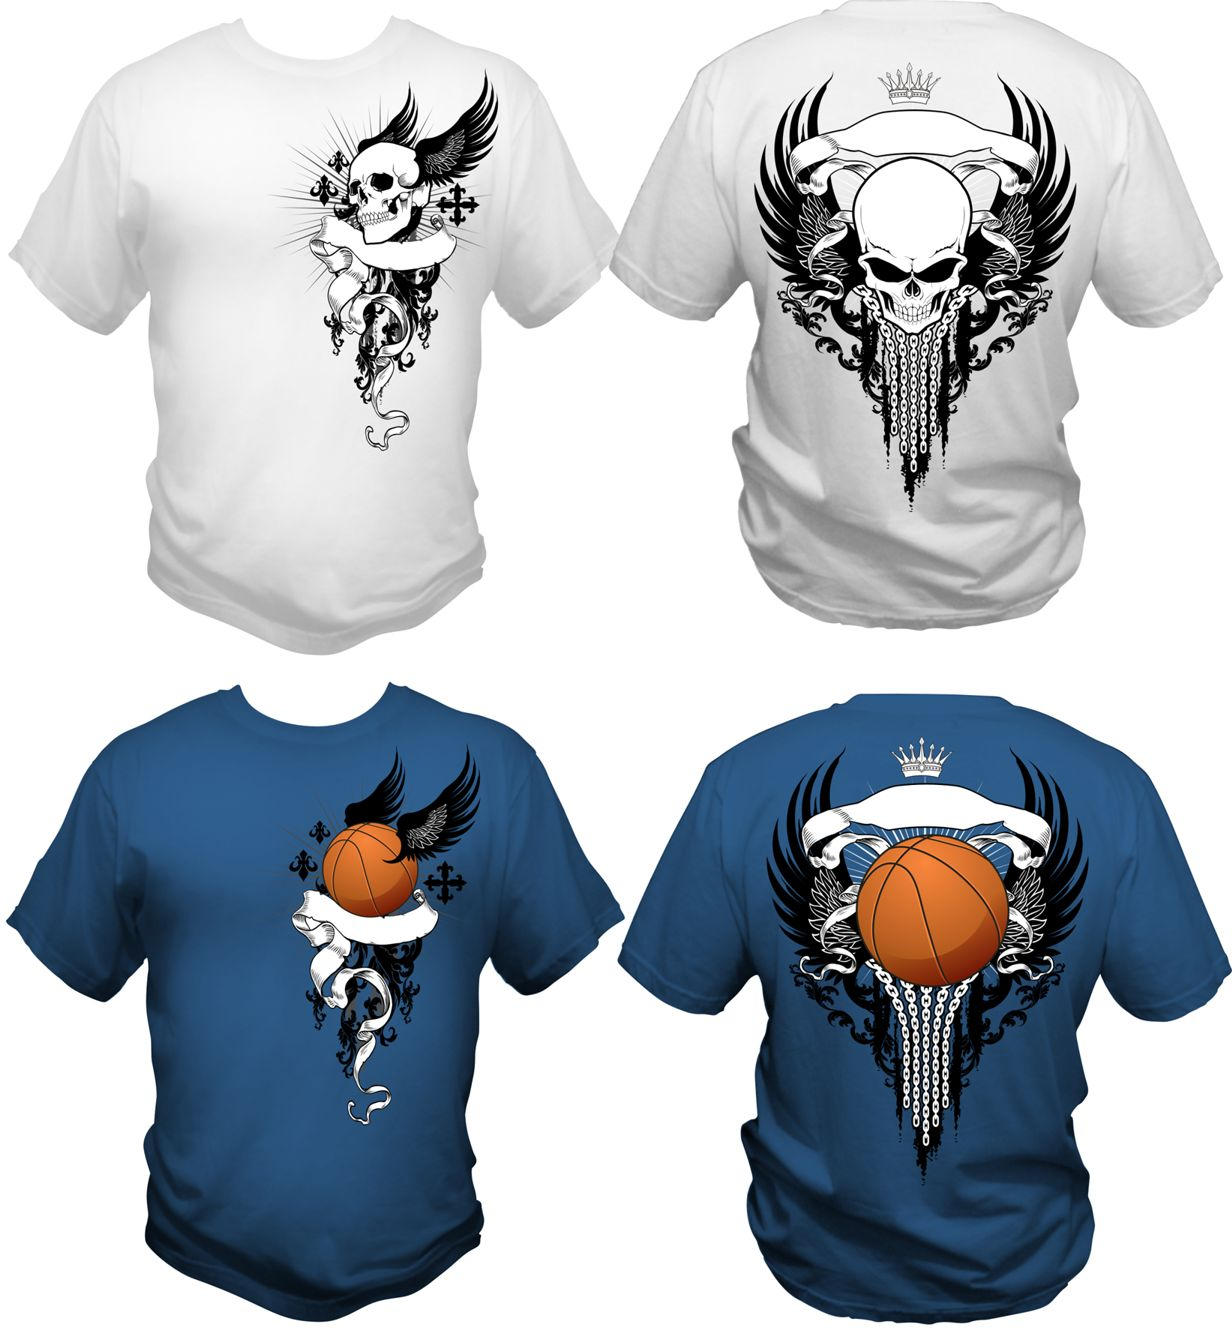 free t shirt design by artamp on deviantart